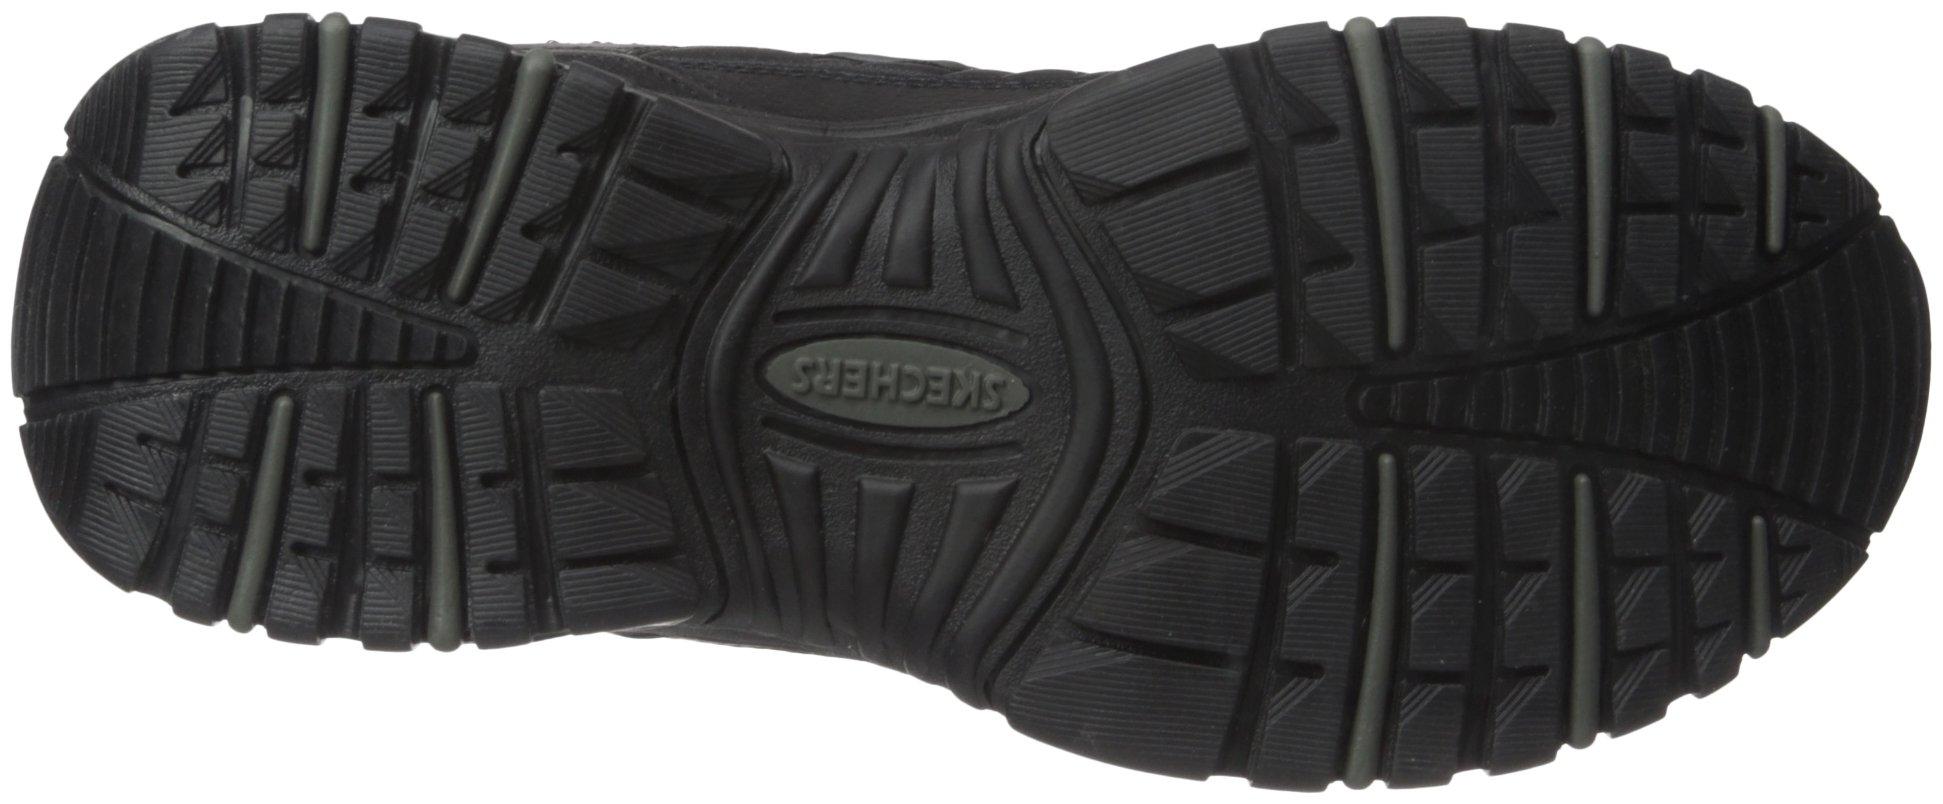 Skechers Sport Men's Energy Afterburn Lace-Up Sneaker,Black,13 M by Skechers (Image #3)